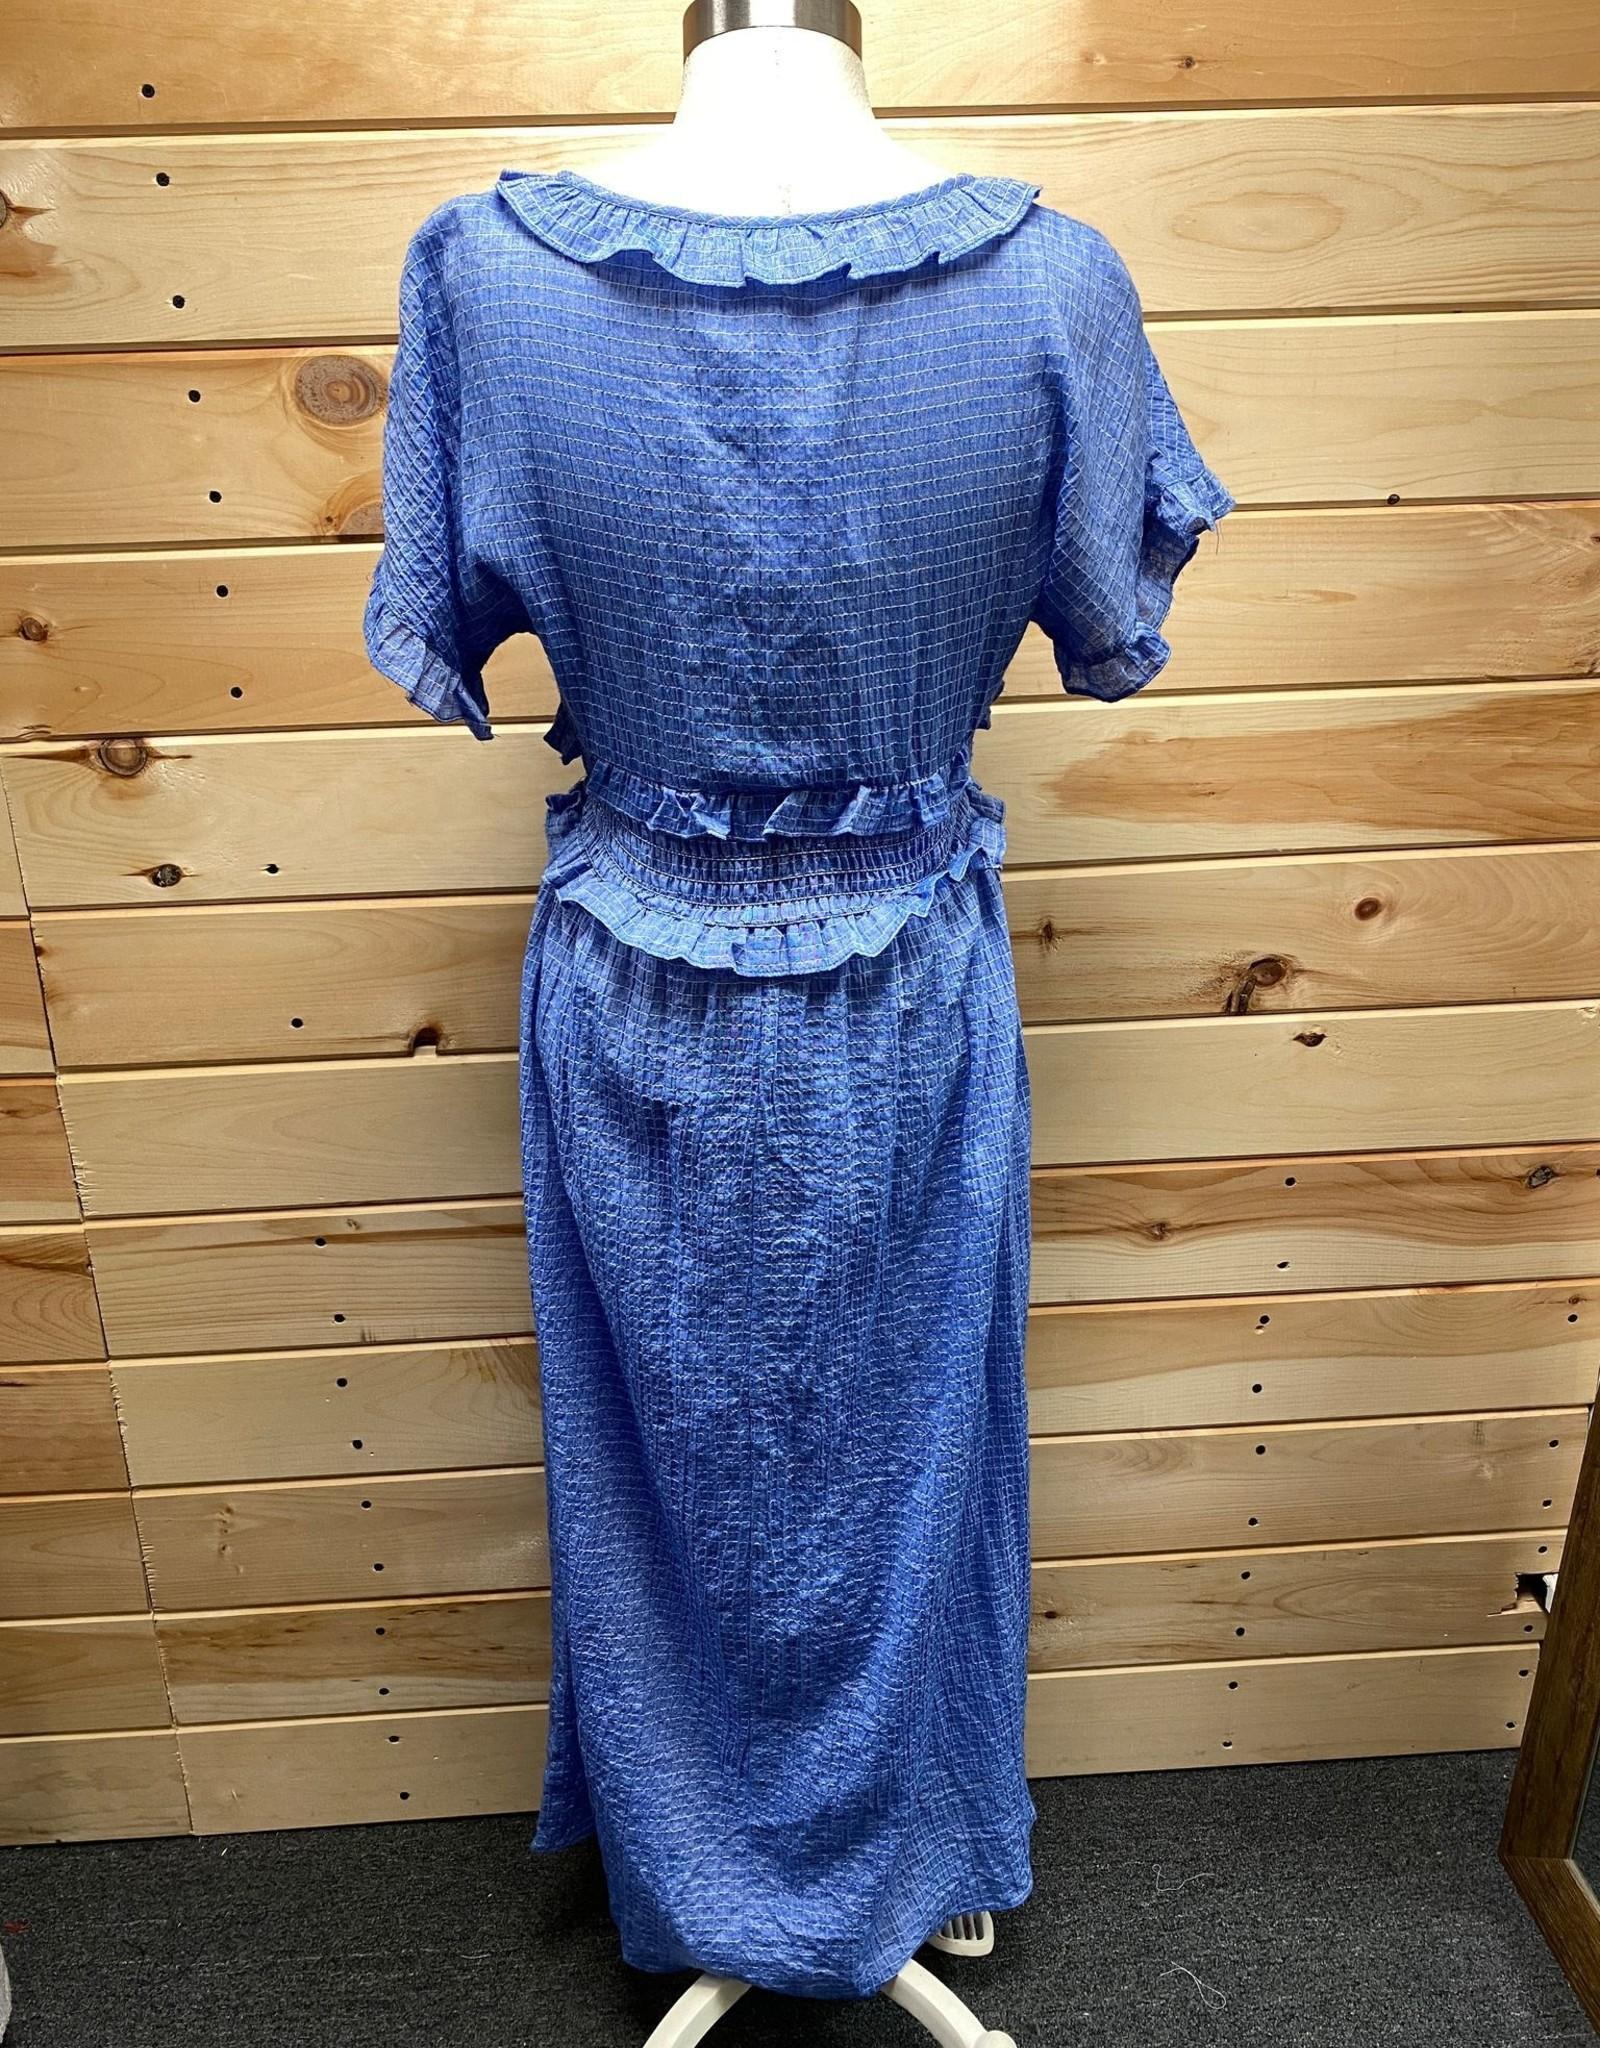 Max studio Max Studio Colbat Dress Size Sm #441E